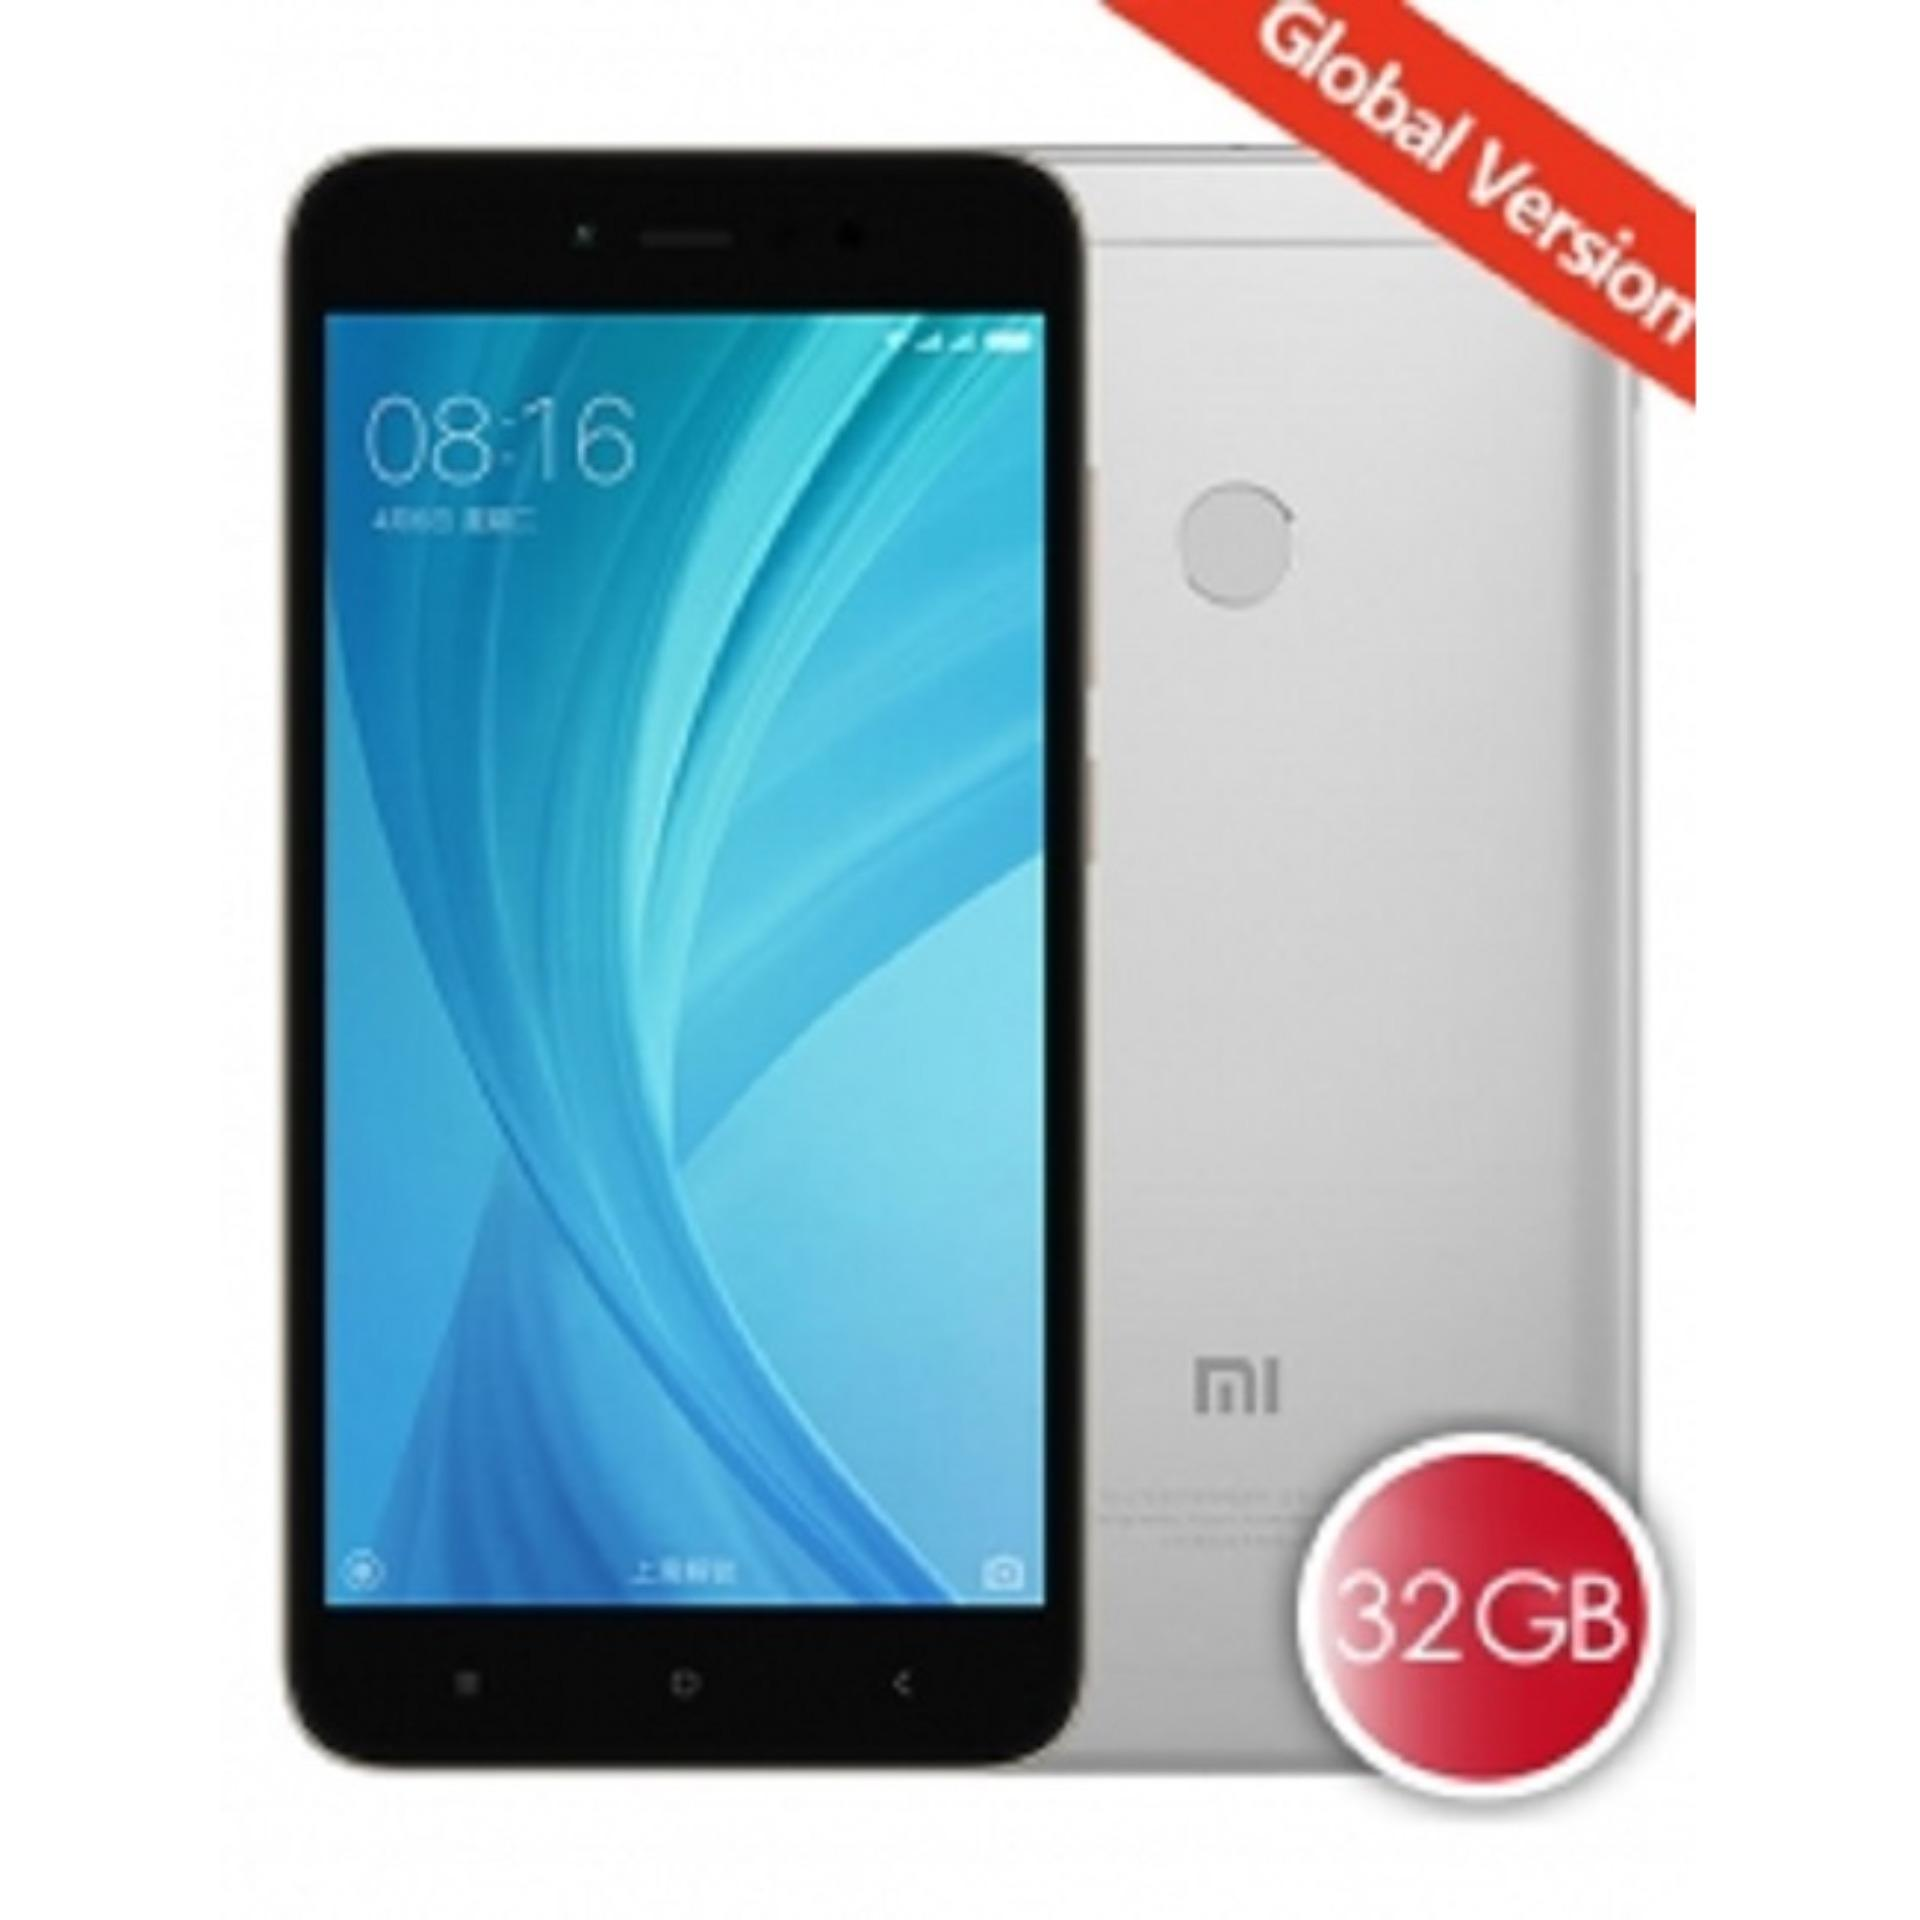 Sale Stock Xiaomi Redmi 4x Ram 3gb 32 Gb Rose Gold Garansi Termurah 2 Internal Distributor Note 5a Prime 32gb 1 Tahun 4a 2gb 16gb